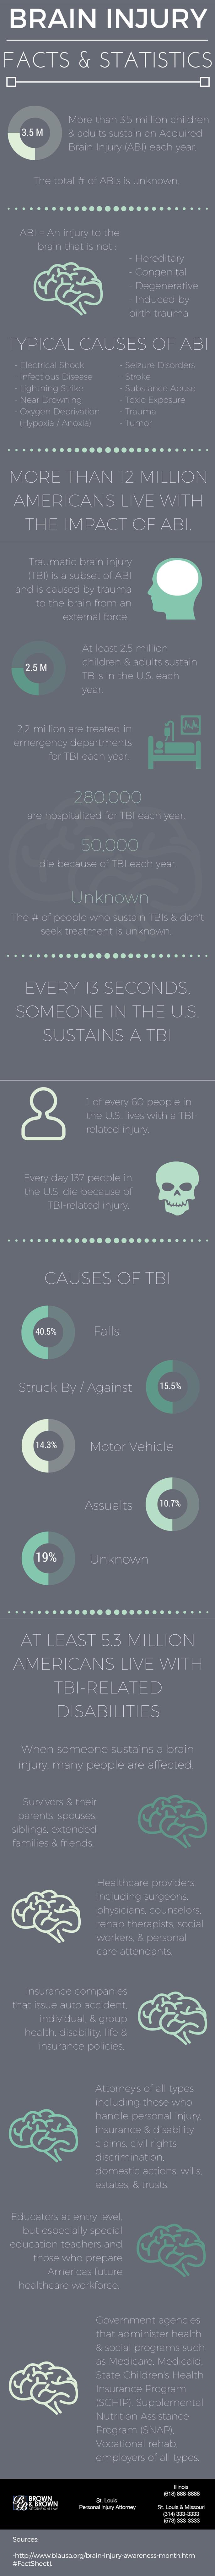 TBI Statistics [infographic]